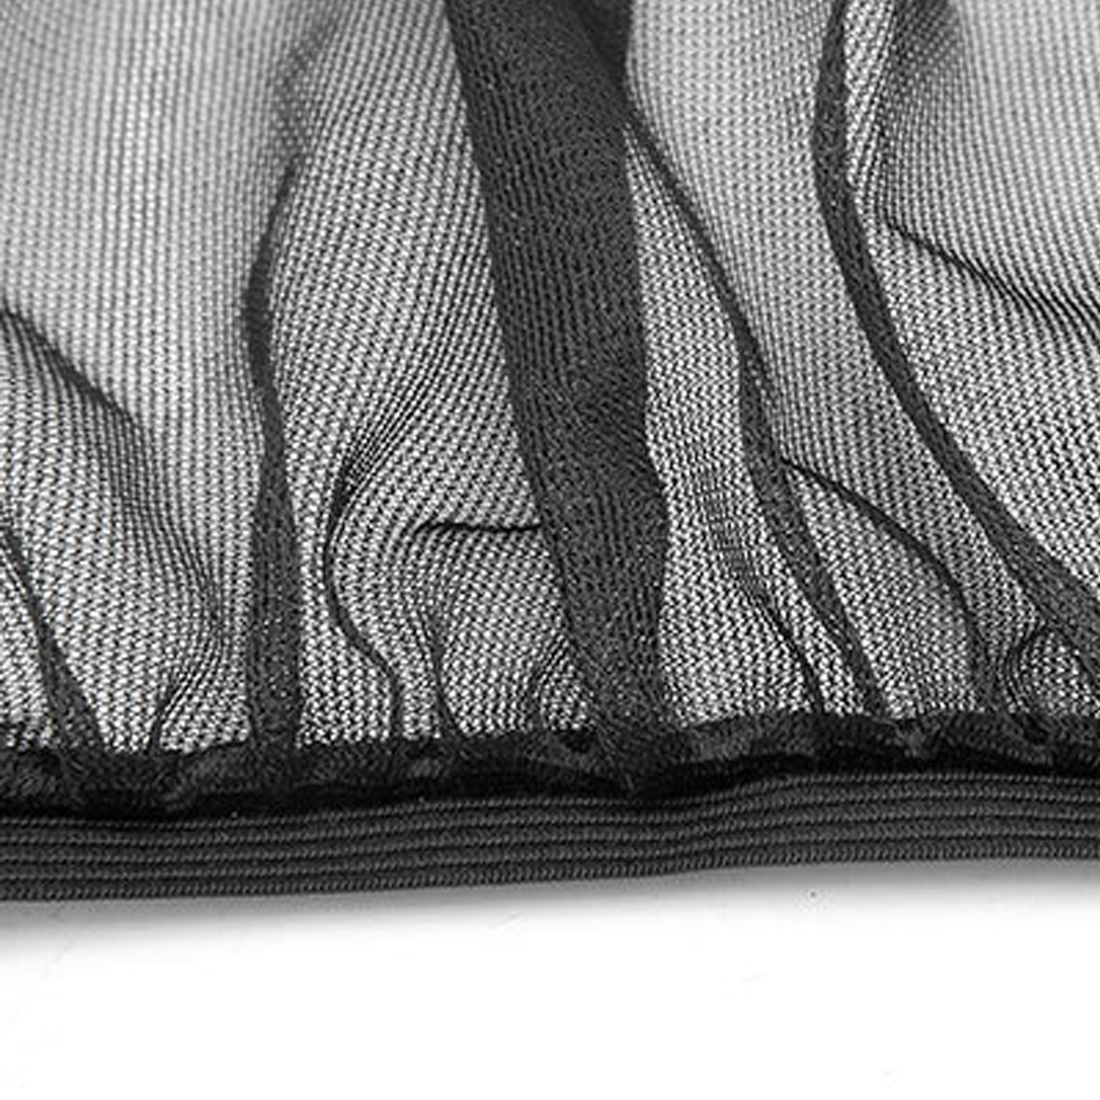 Dewtreetali NEWESTAdjustable Auto Car Side Rear Window Sun Shade Black Mesh Car Cover Visor Shield Sunshade UV Protection